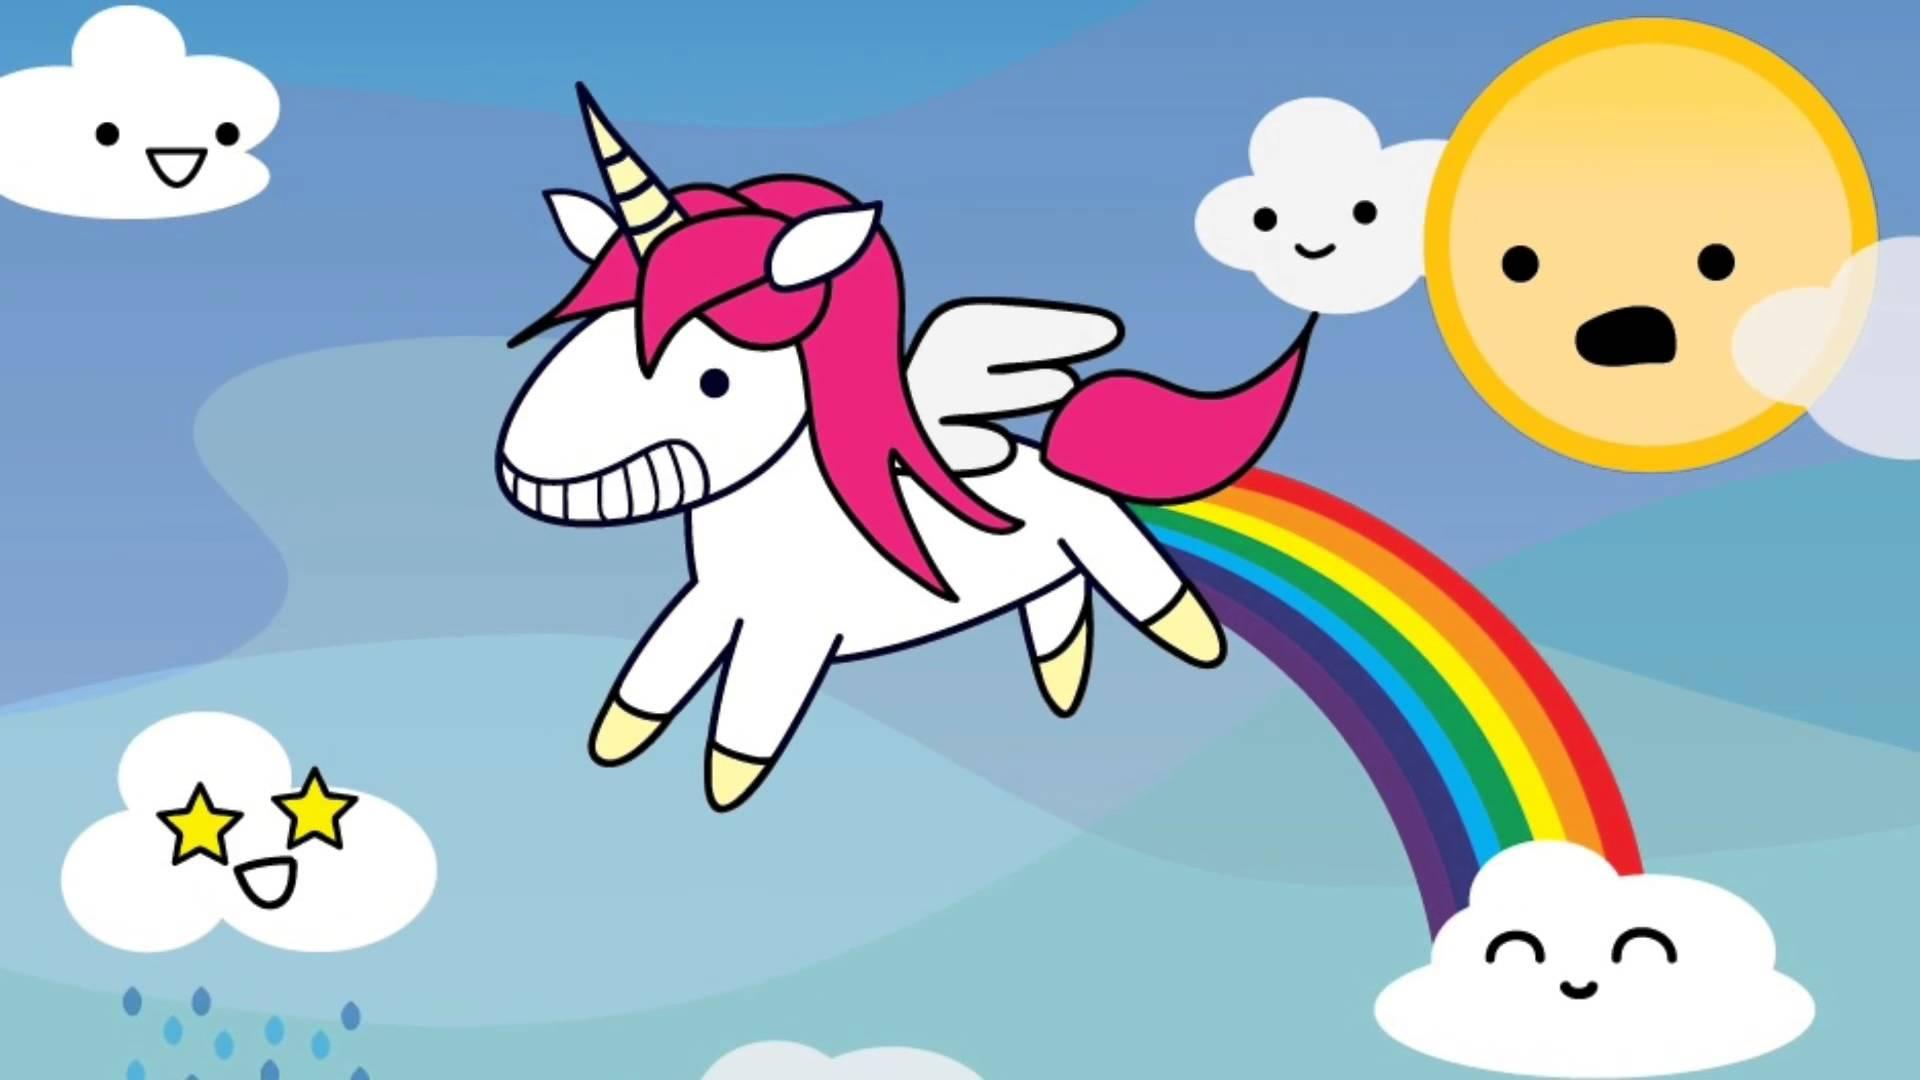 Cute Rainbow Unicorn Desktop Wallpapers Top Free Cute Rainbow Unicorn Desktop Backgrounds Wallpaperaccess